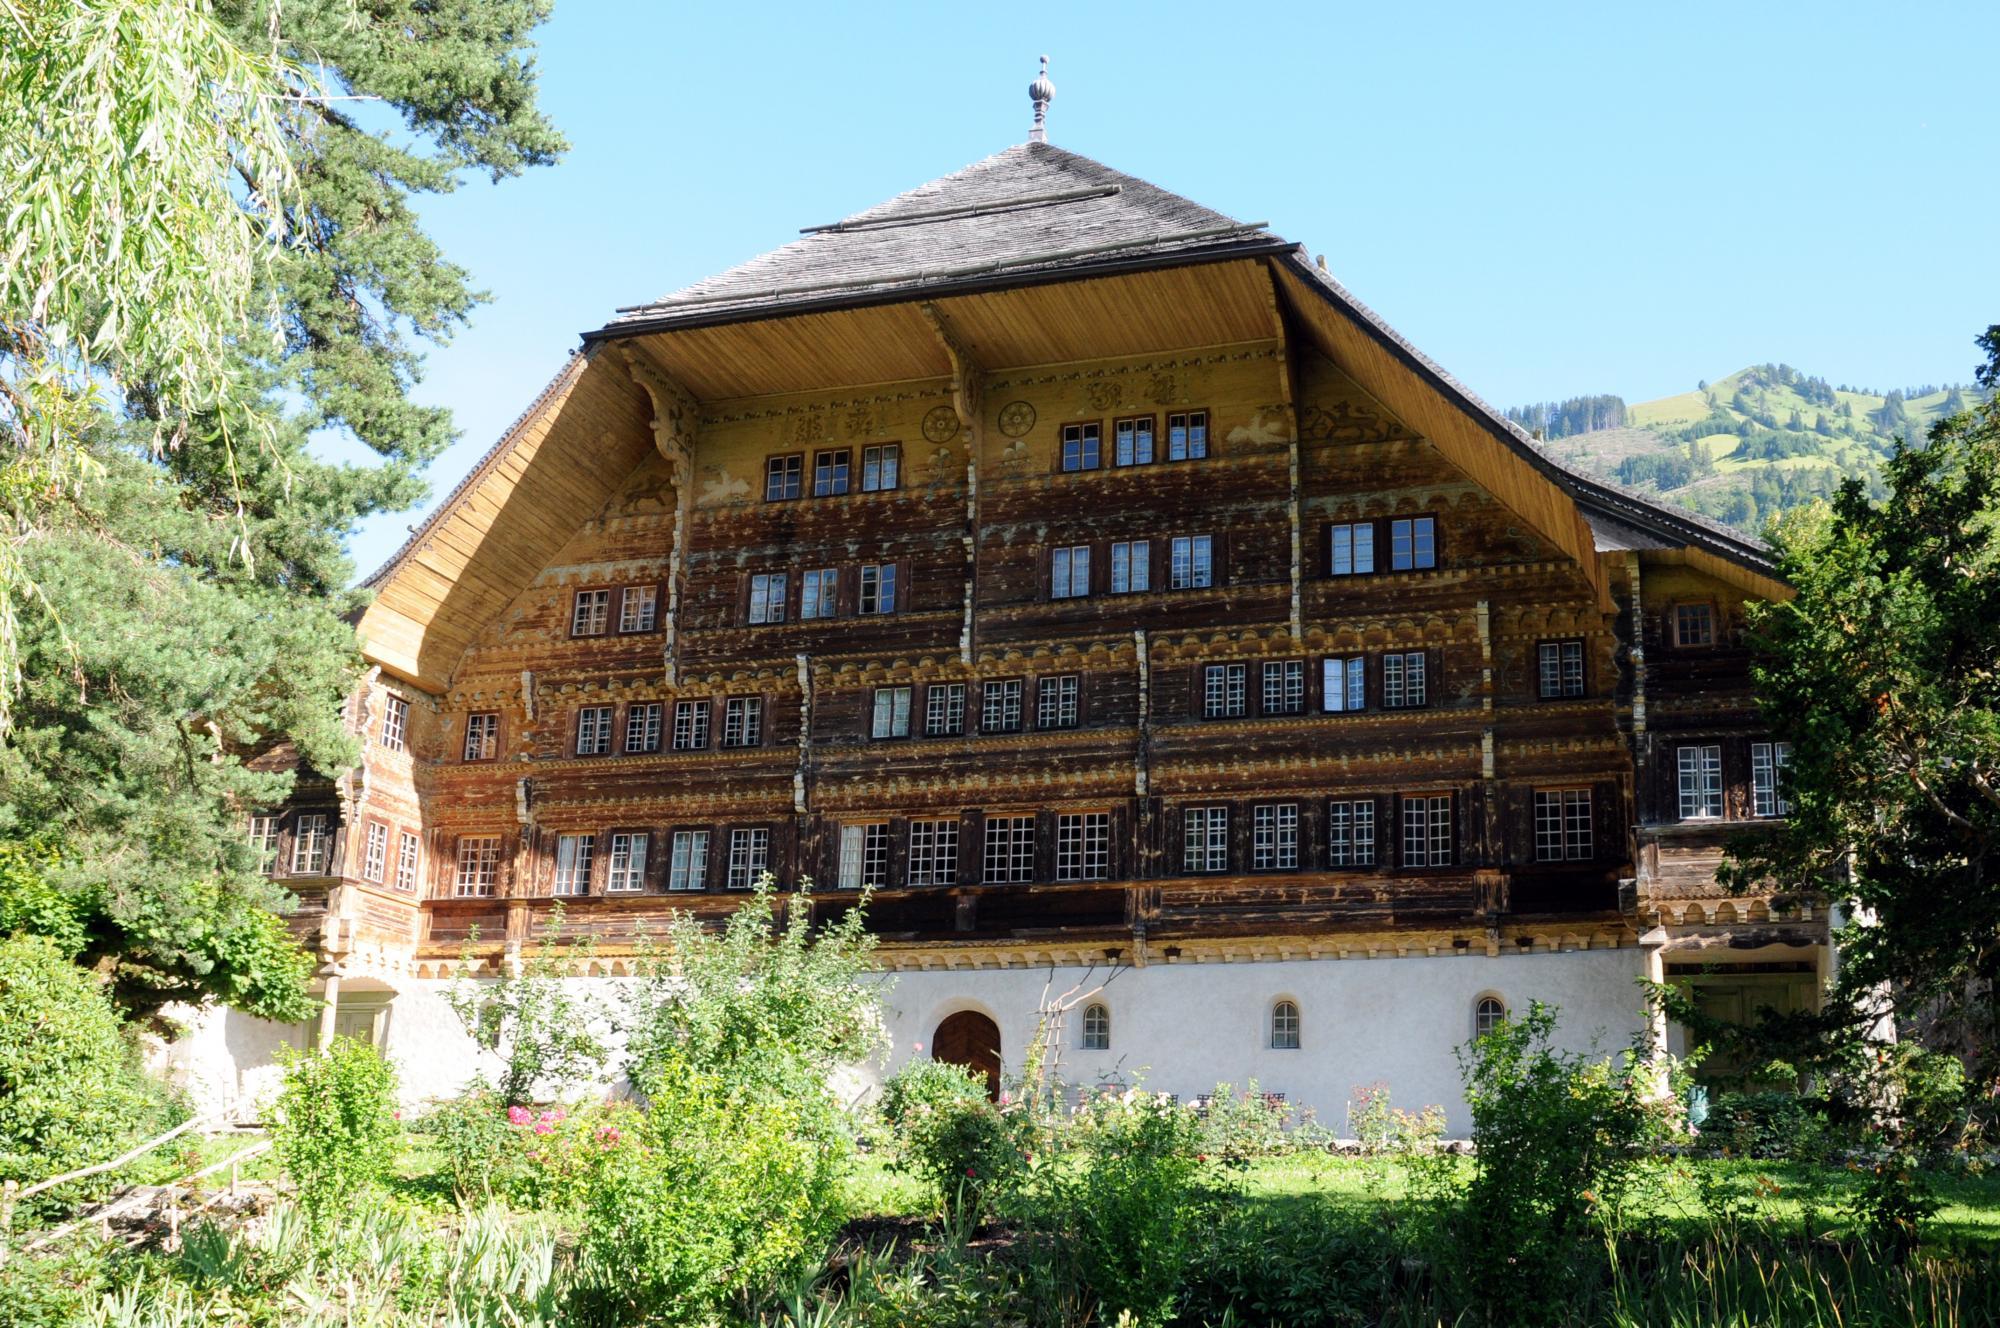 Grand Chalet De Rossiniere Pays D Enhaut Switzerland